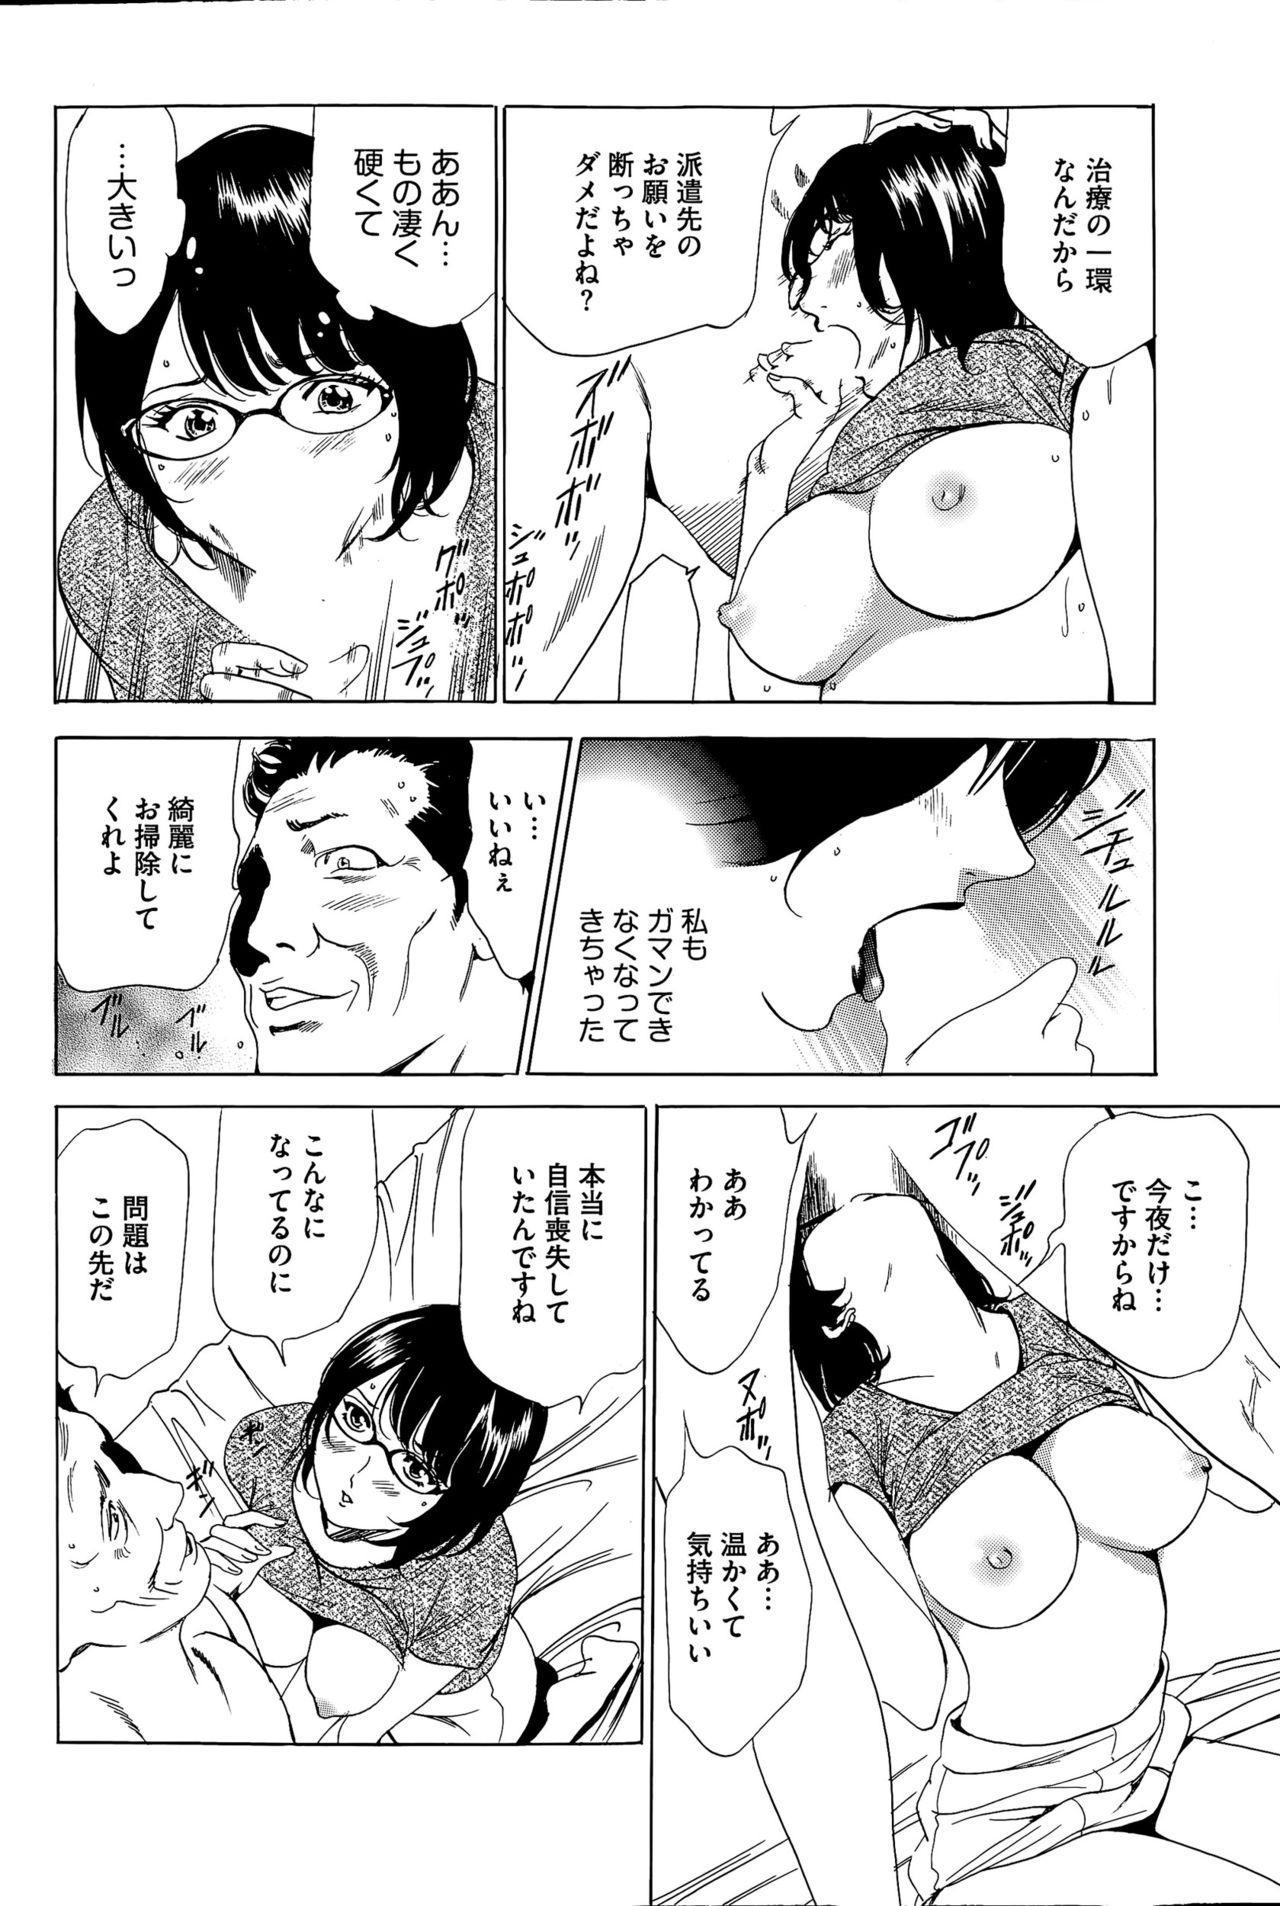 Wa Usuki Ipa a 1-10 16